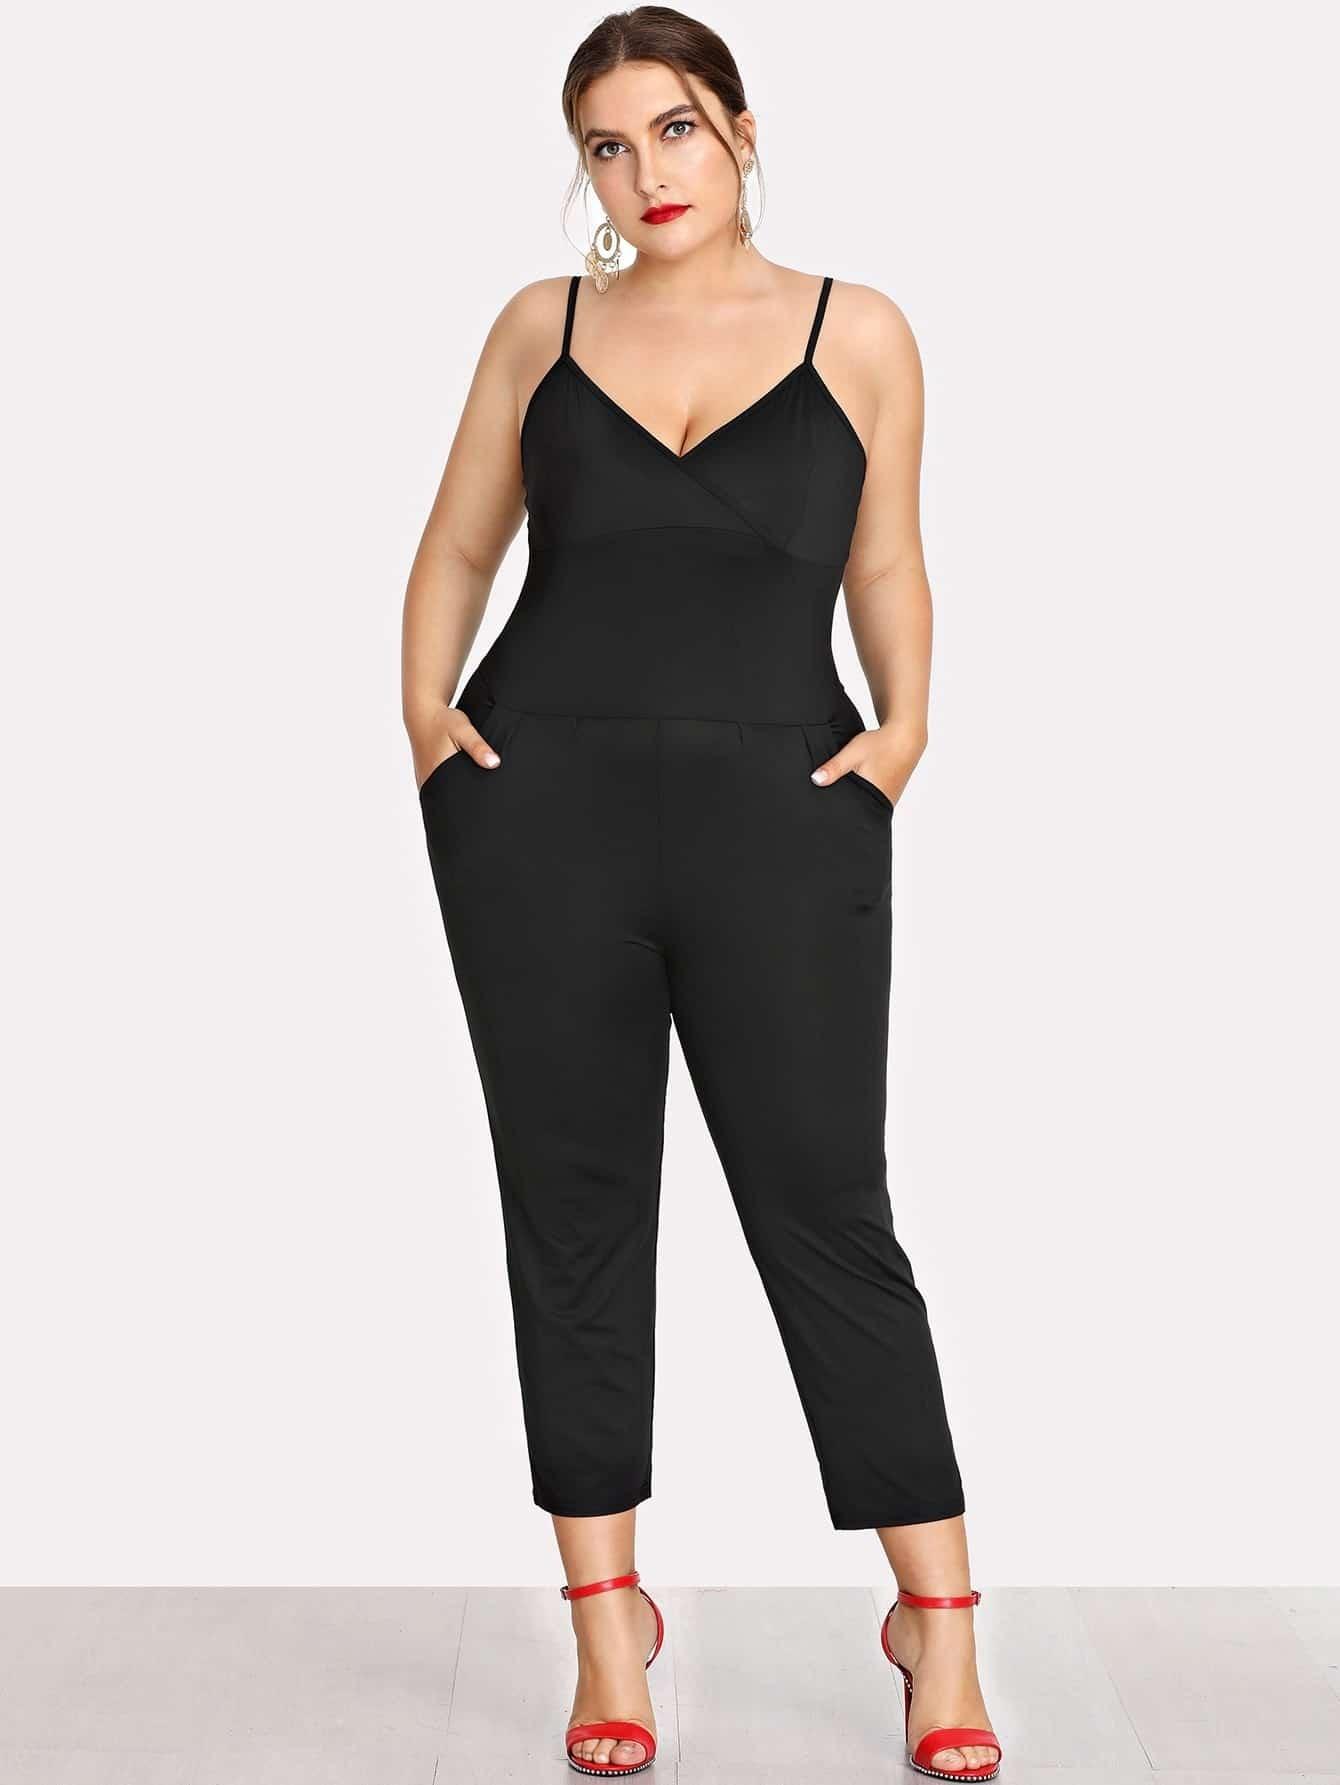 Surplice Neckline Cami Jumpsuit jumpsuit180308301